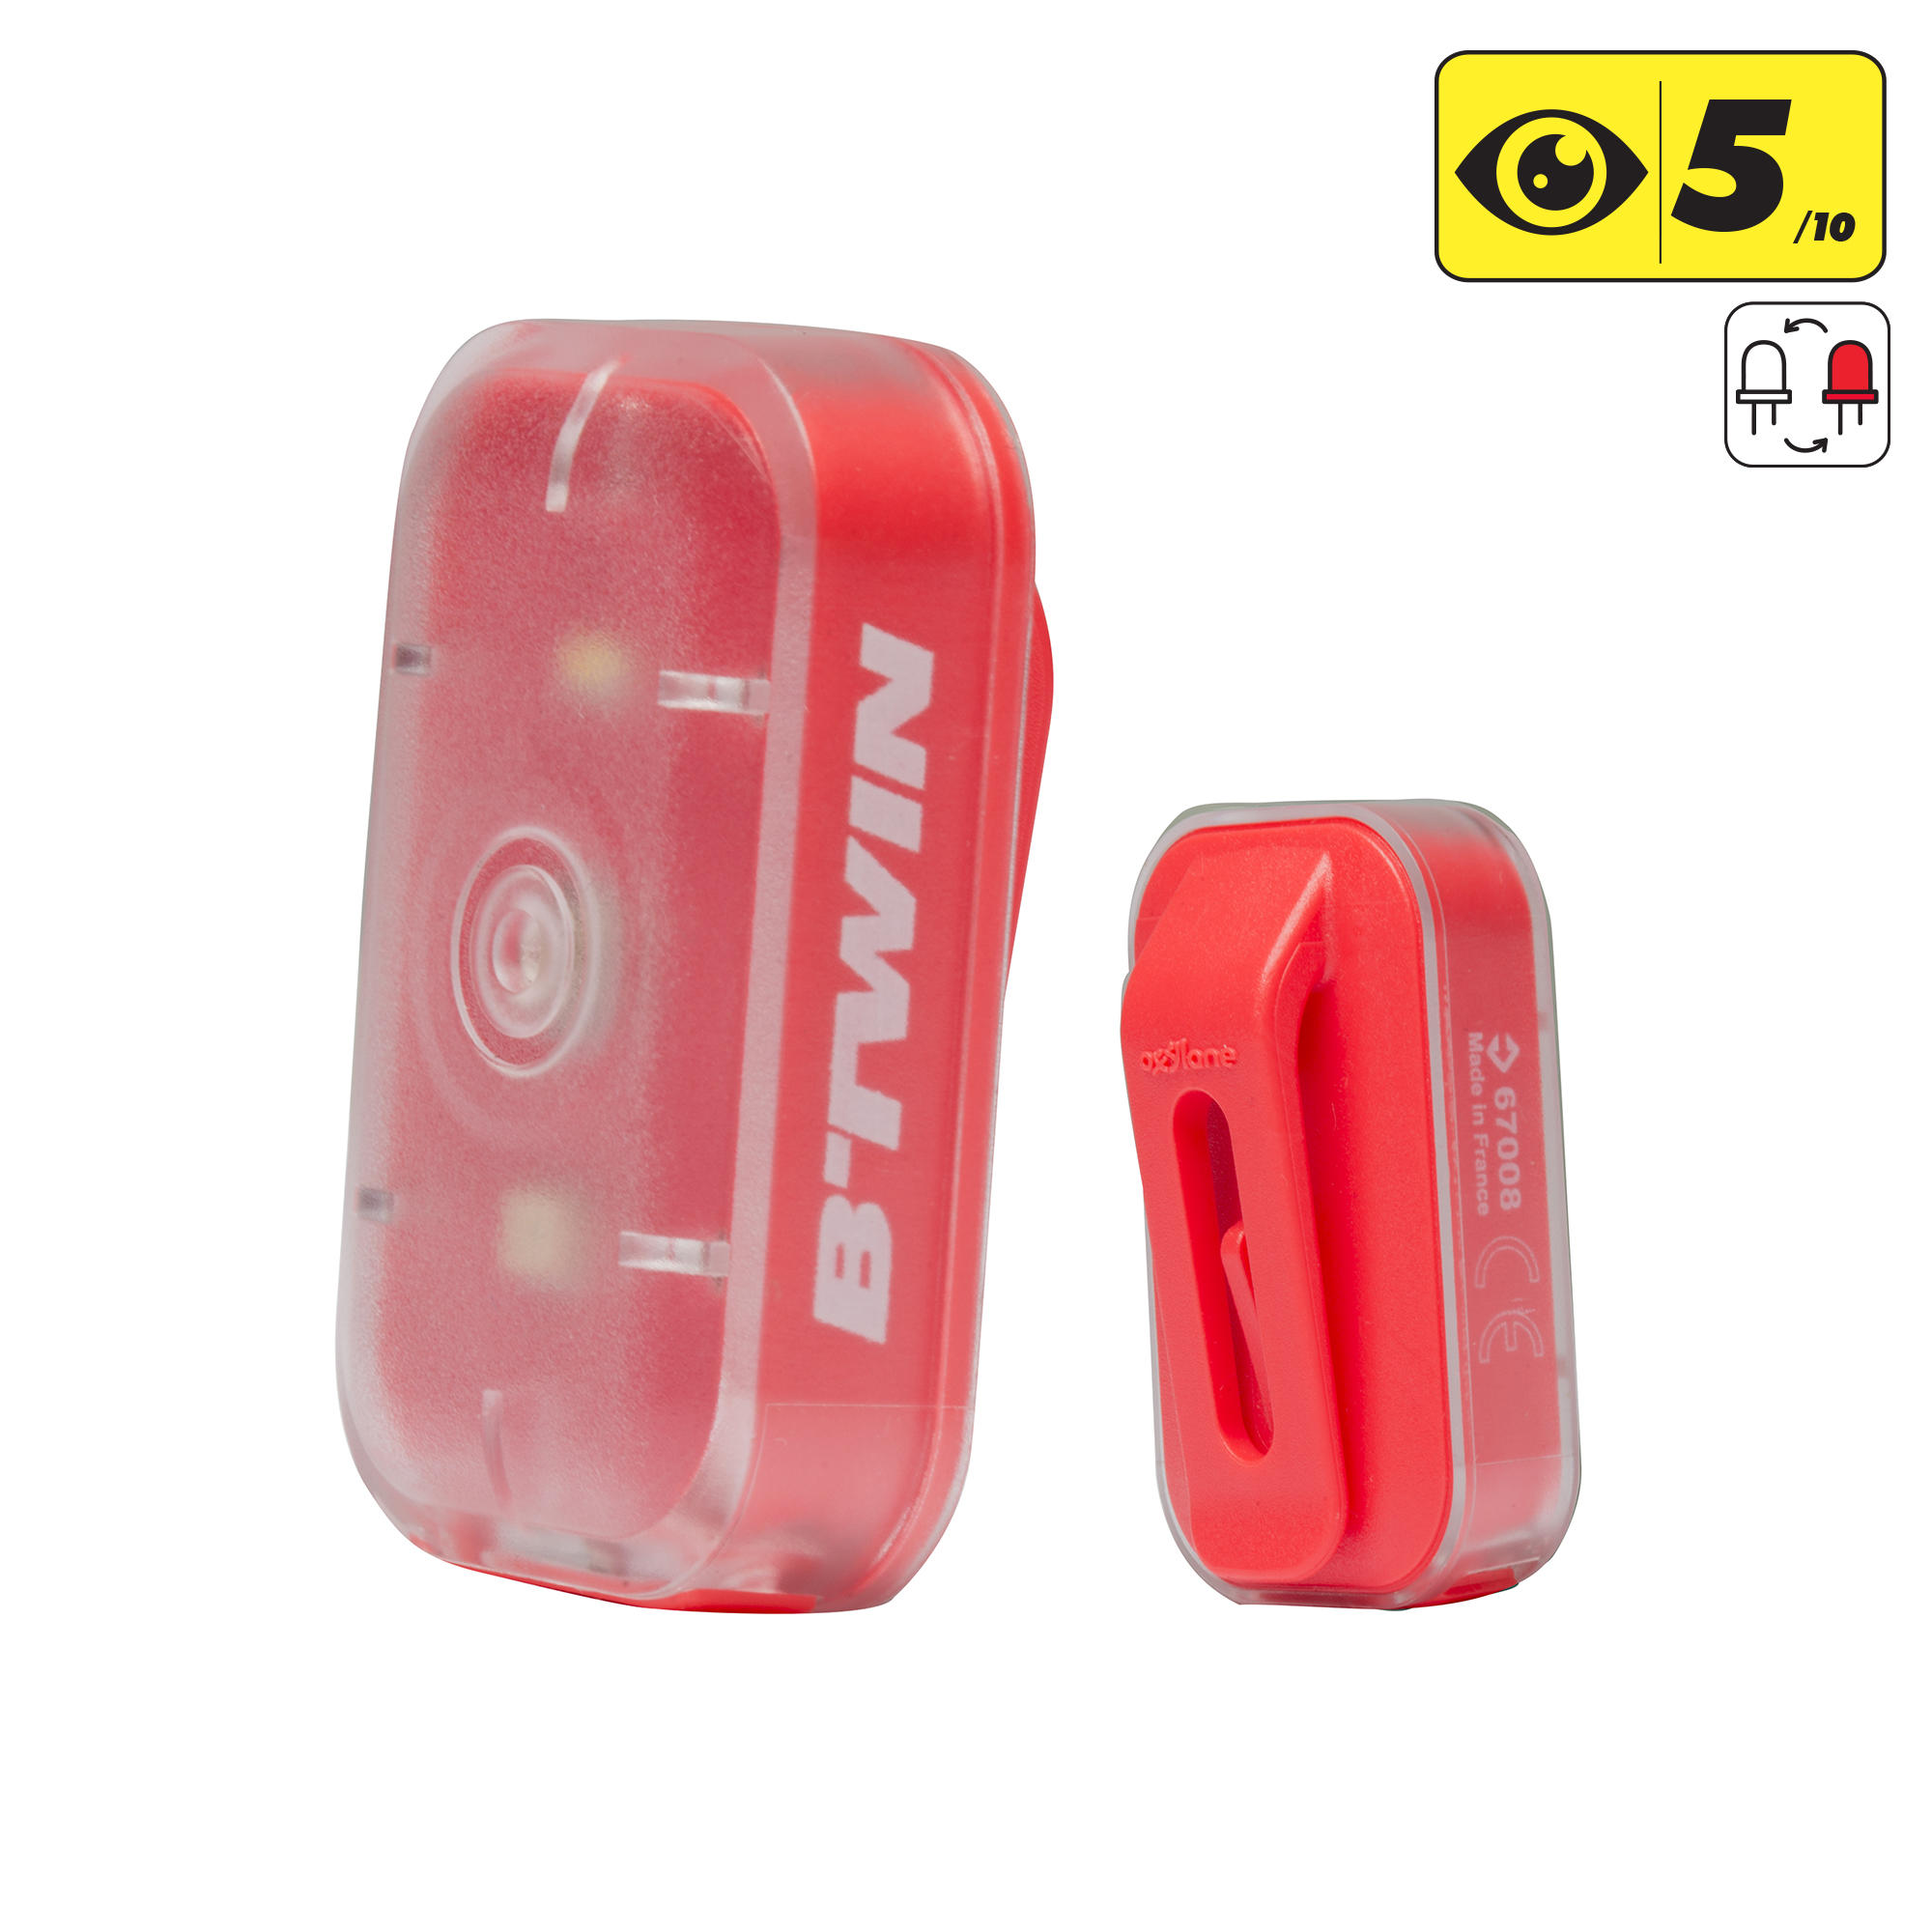 Vioo Clip 500 Bike Light - Pink